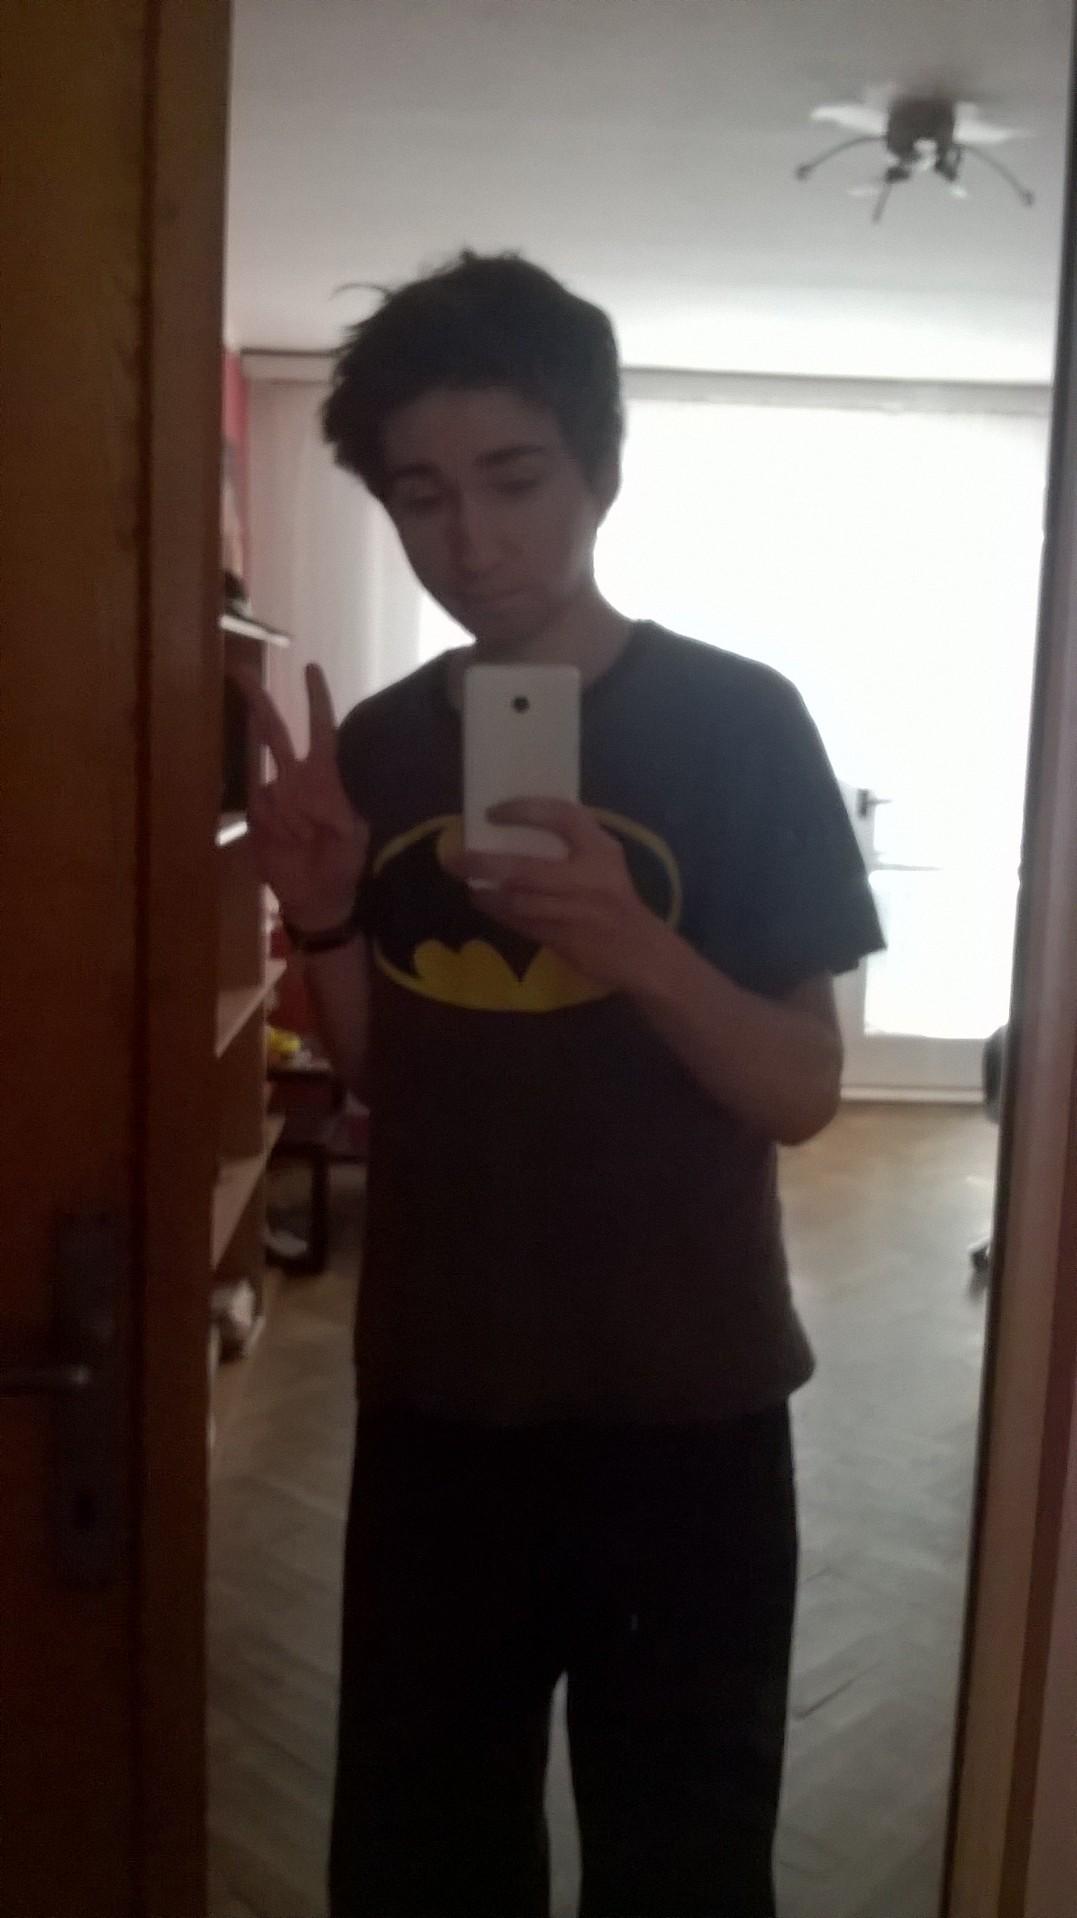 hikaru tenshin hokonono peace batman pajamas mirror